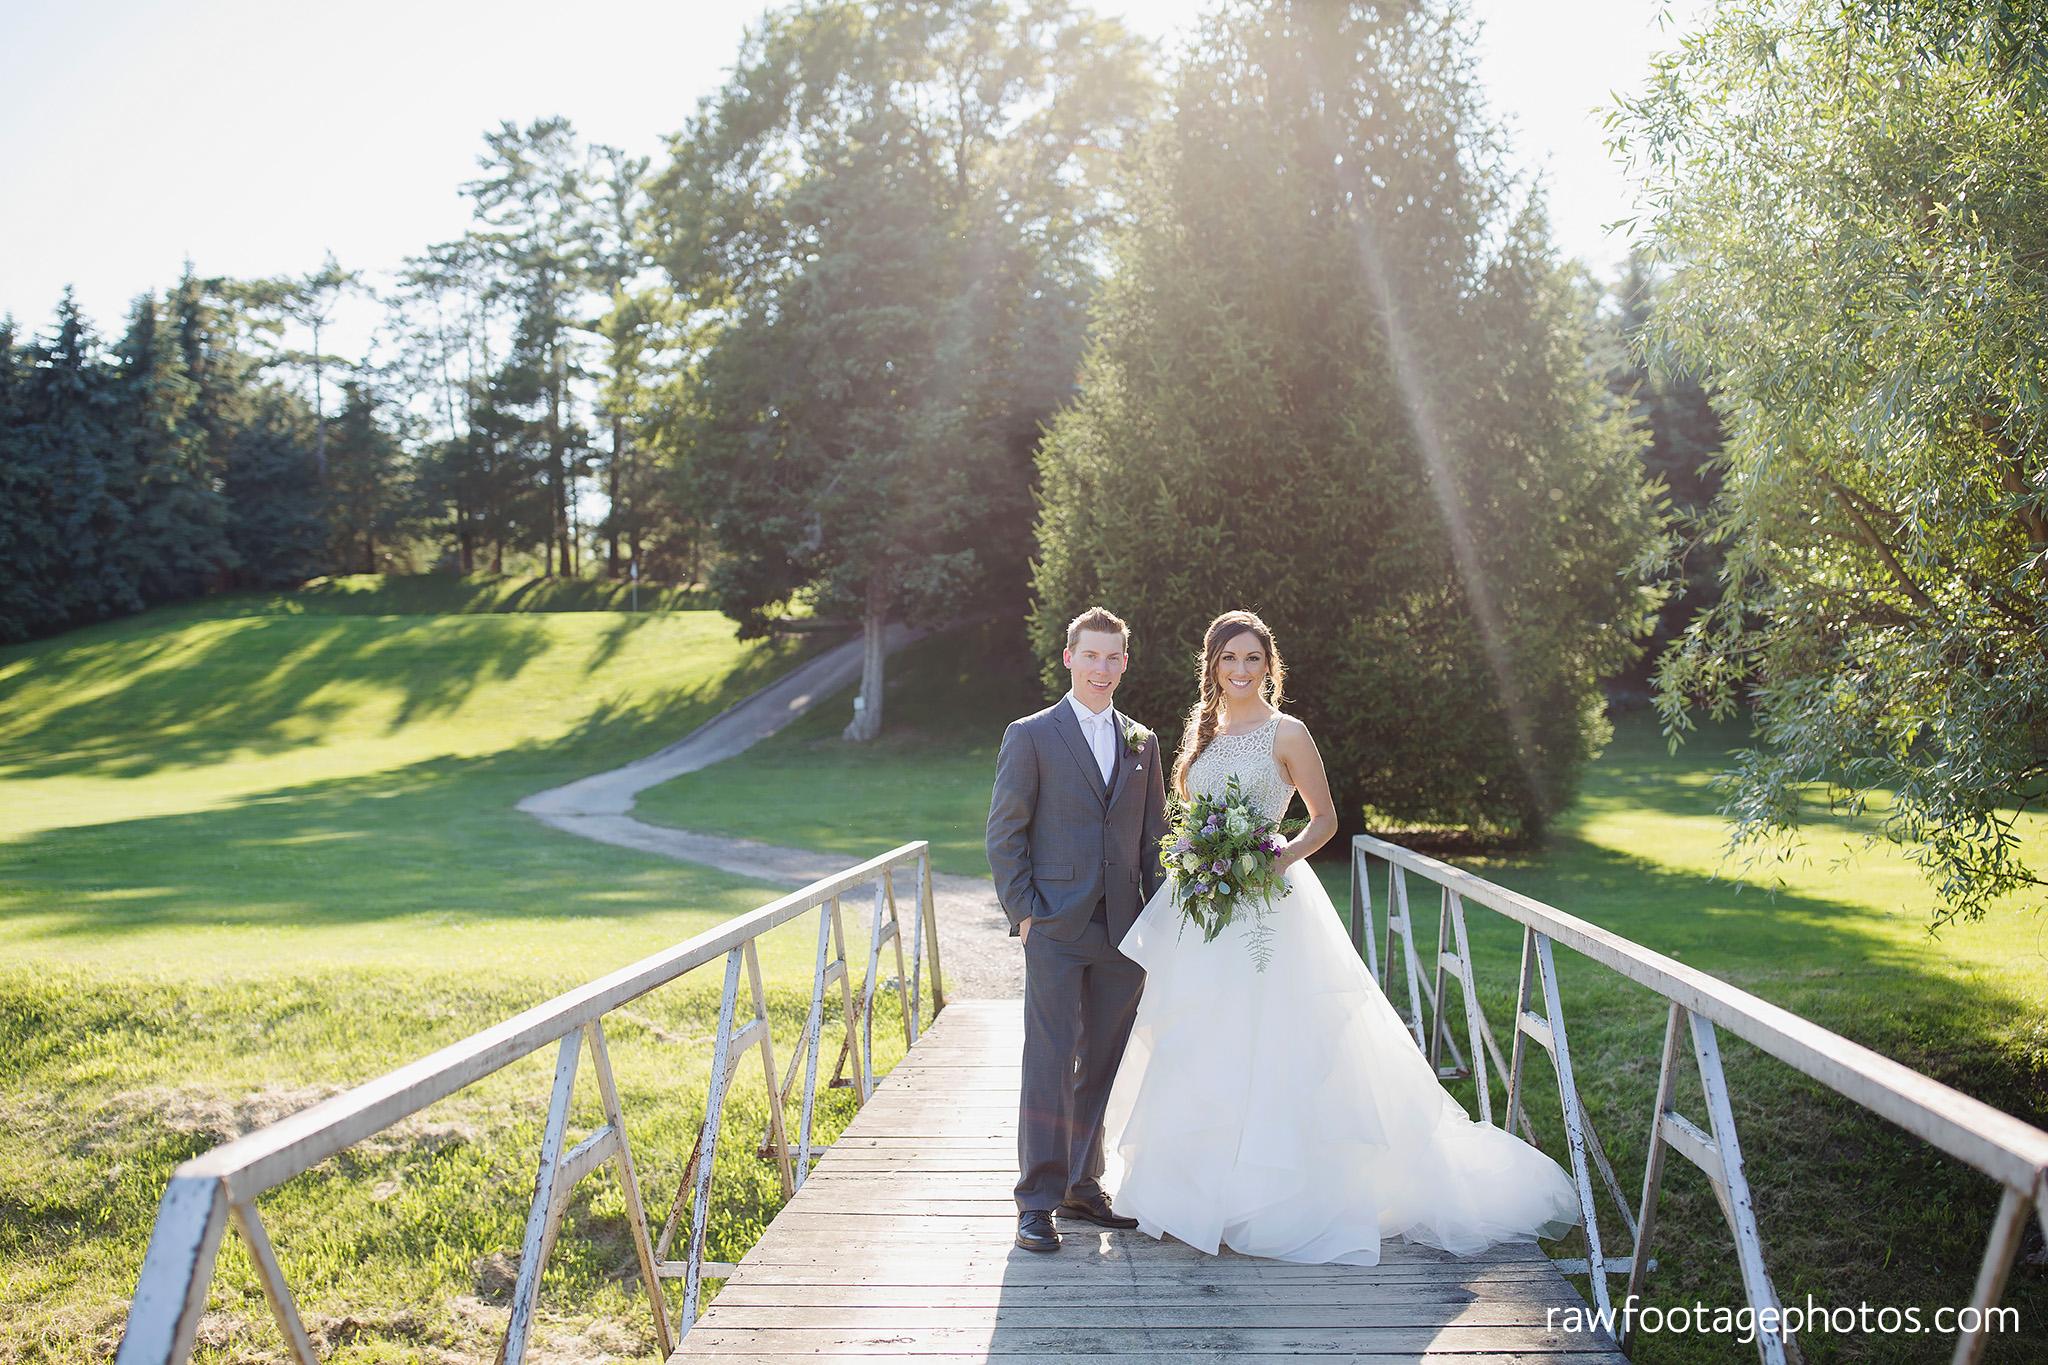 london_ontario_wedding_photographer-grand_bend_wedding_photographer-oakwood_resort_wedding-beach_wedding-sunset_wedding-raw_footage_photography049.jpg